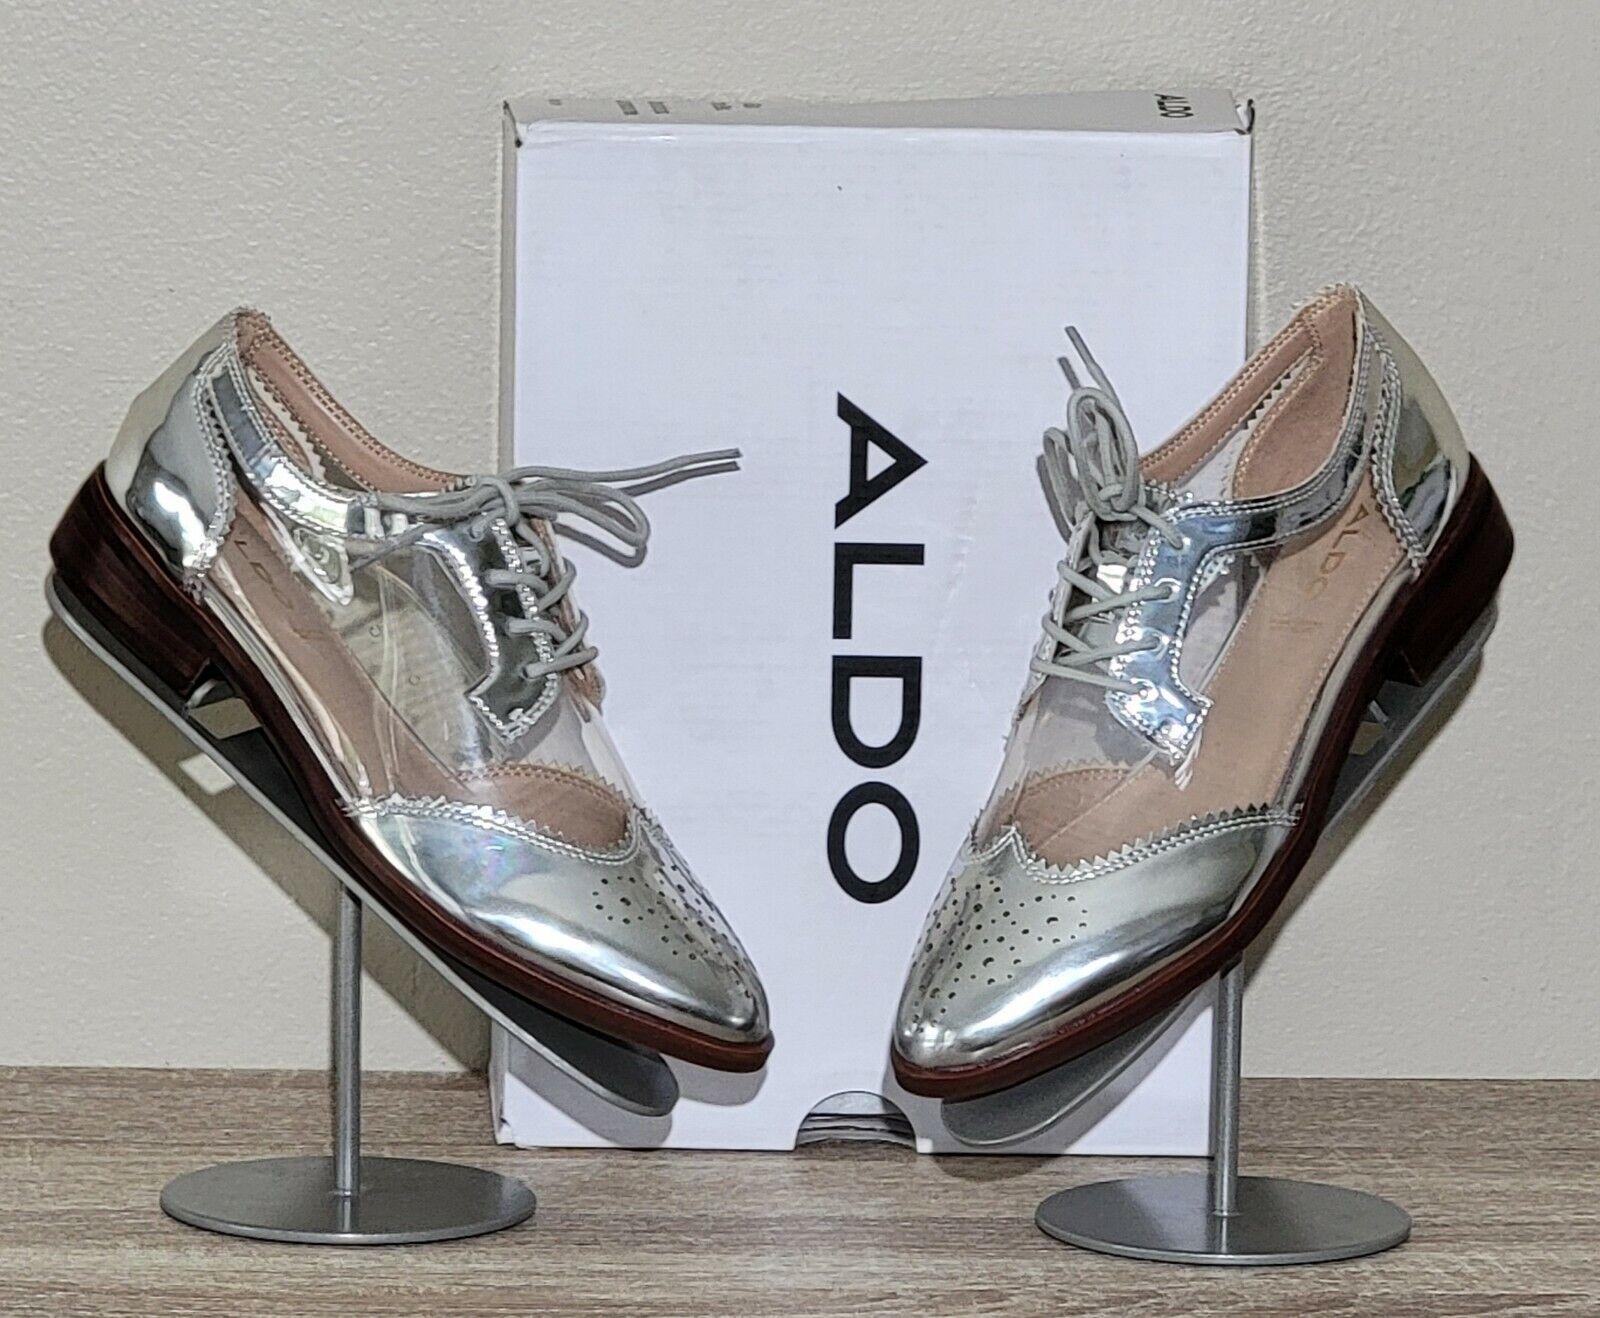 New in Box ALDO Womens POLKA Oxford lace shoe - Silver / Clear Size 6